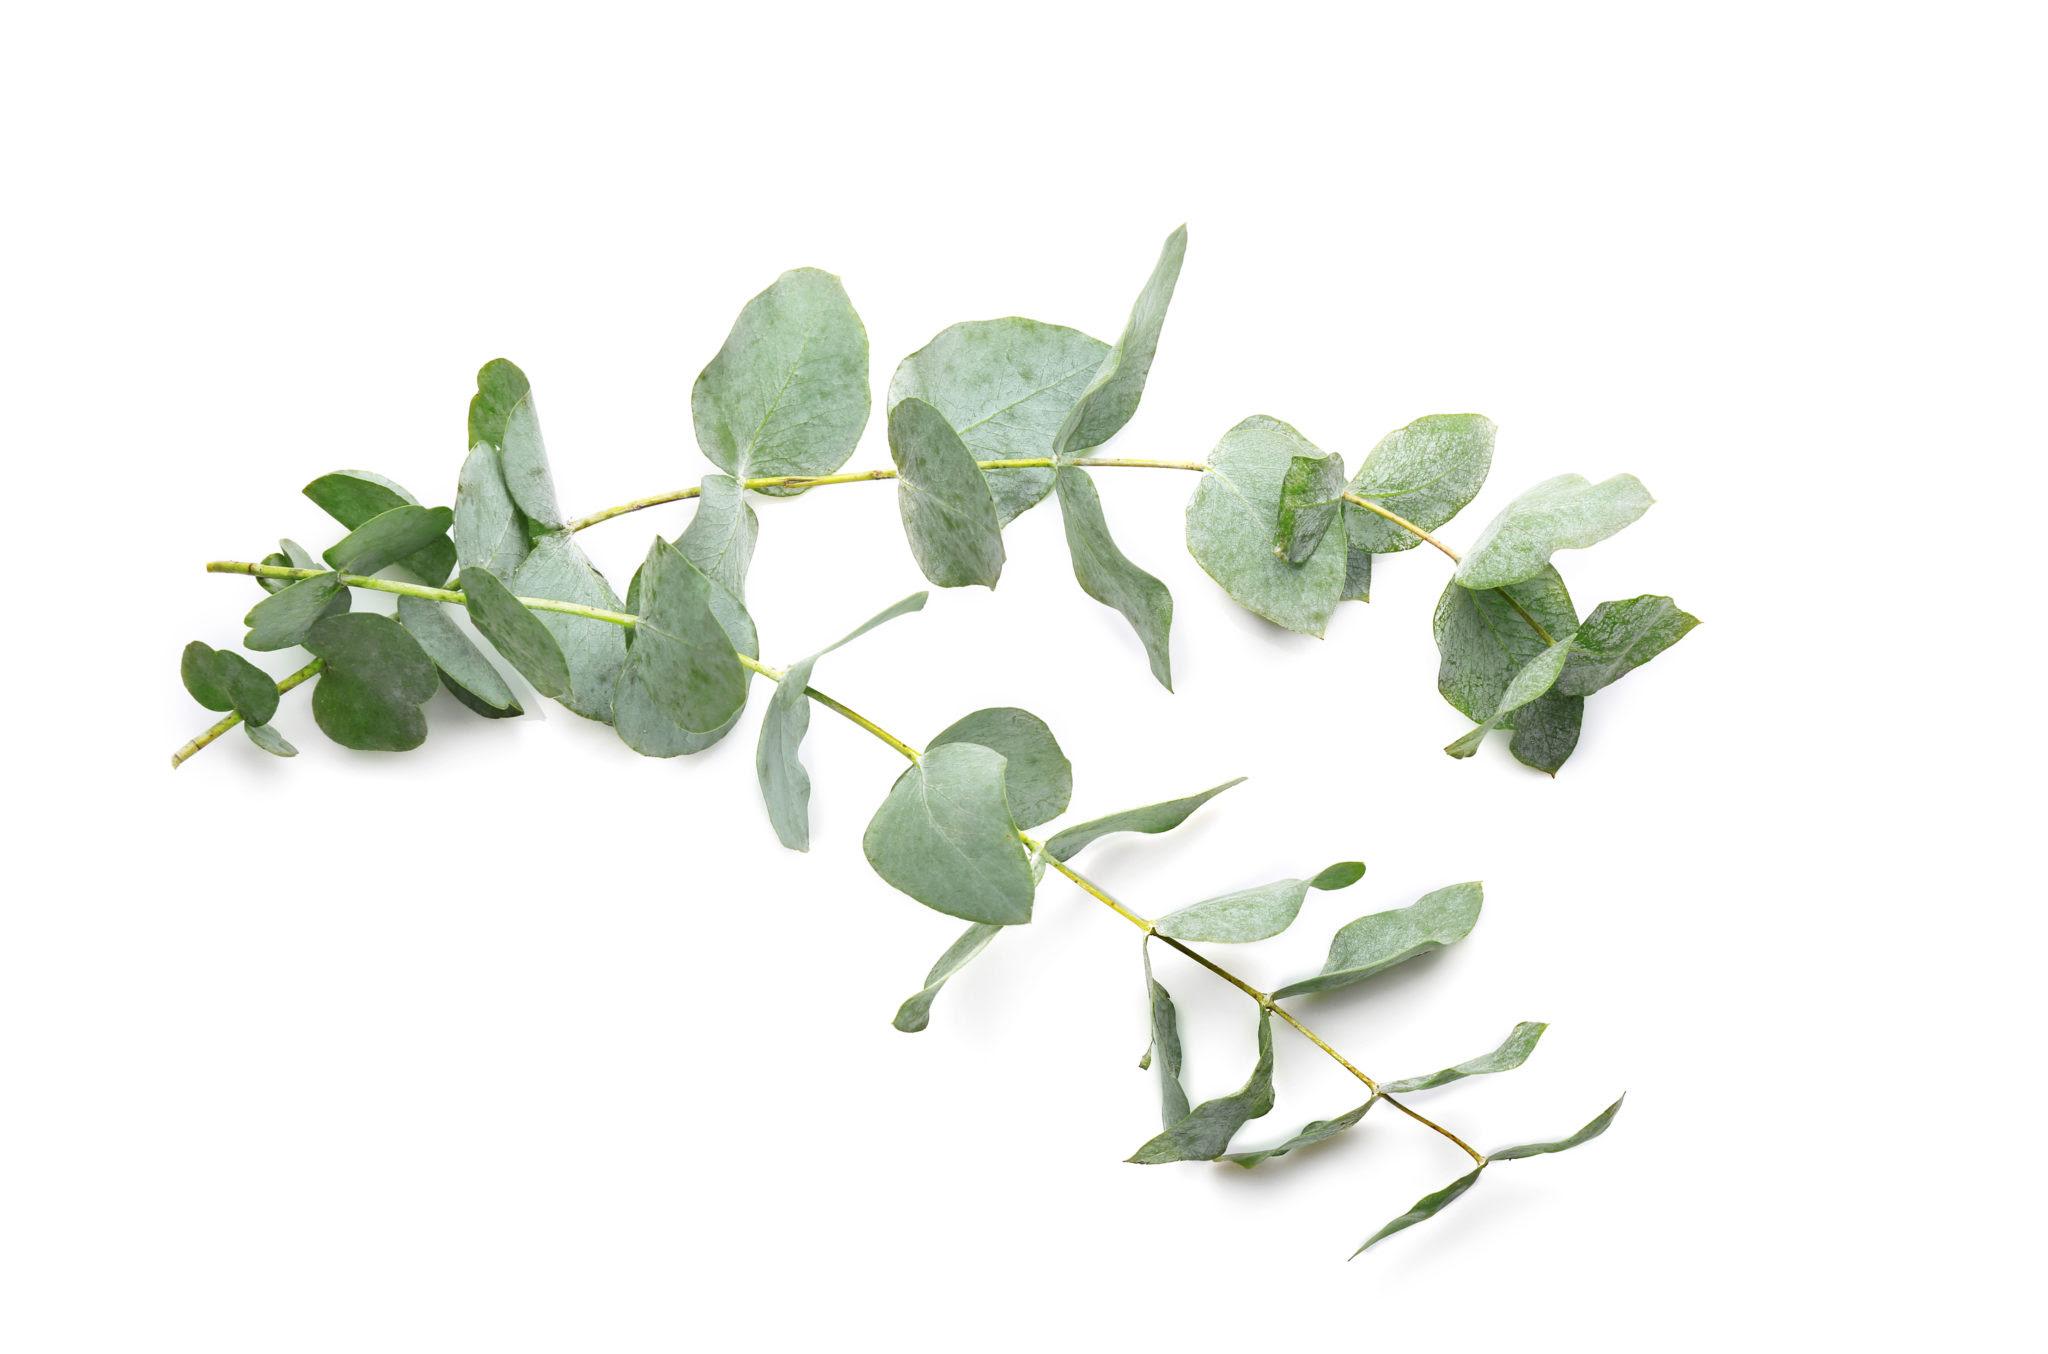 bigstock Green eucalyptus branches on w 158655248